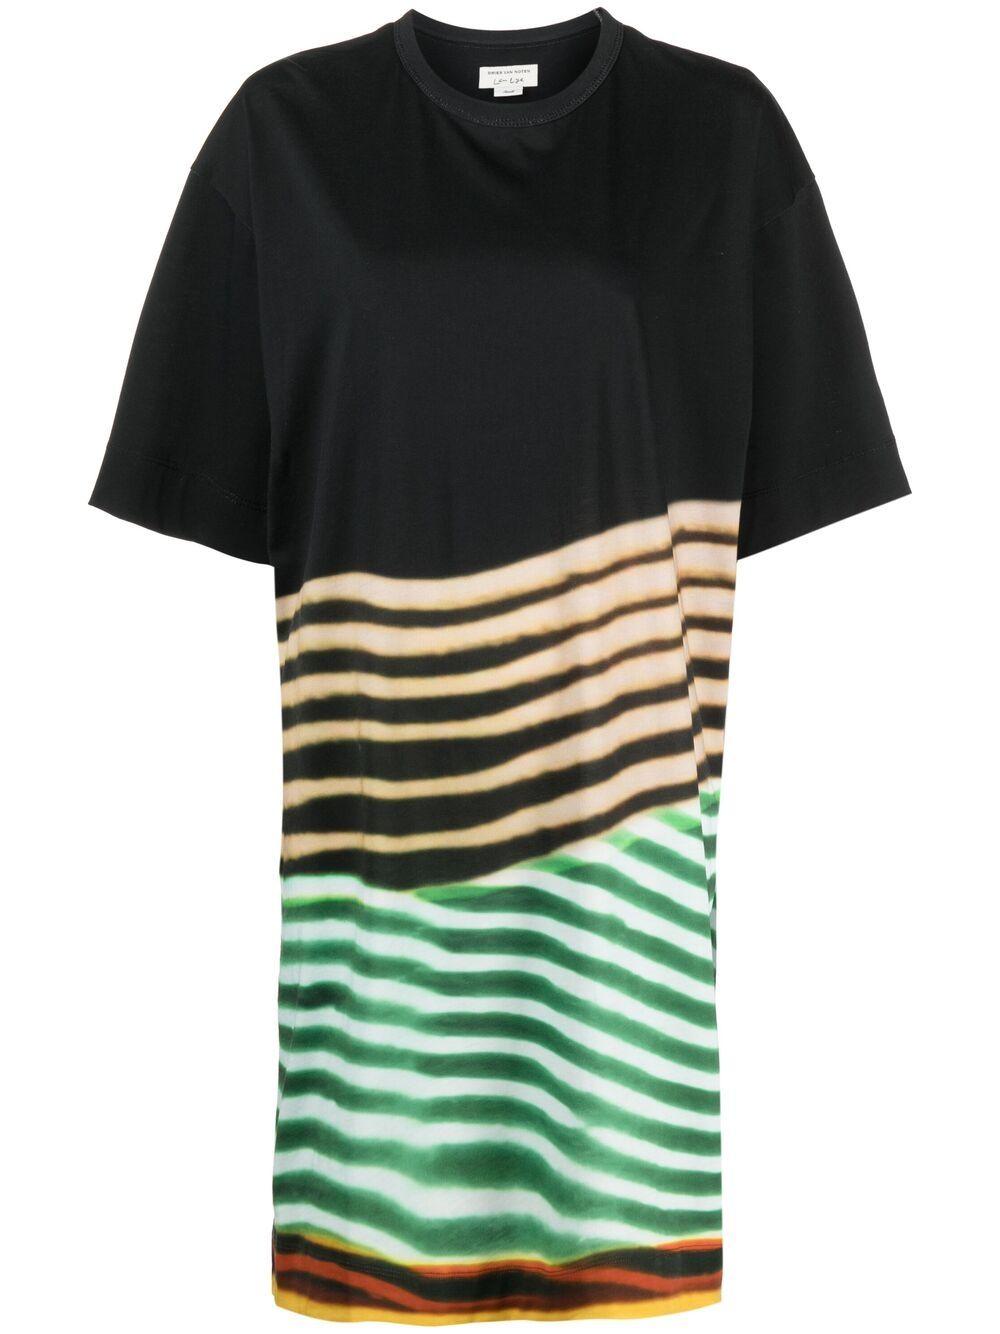 Abito modello T-shirt DRIES VAN NOTEN | Abito | HAGELSONPR2622604